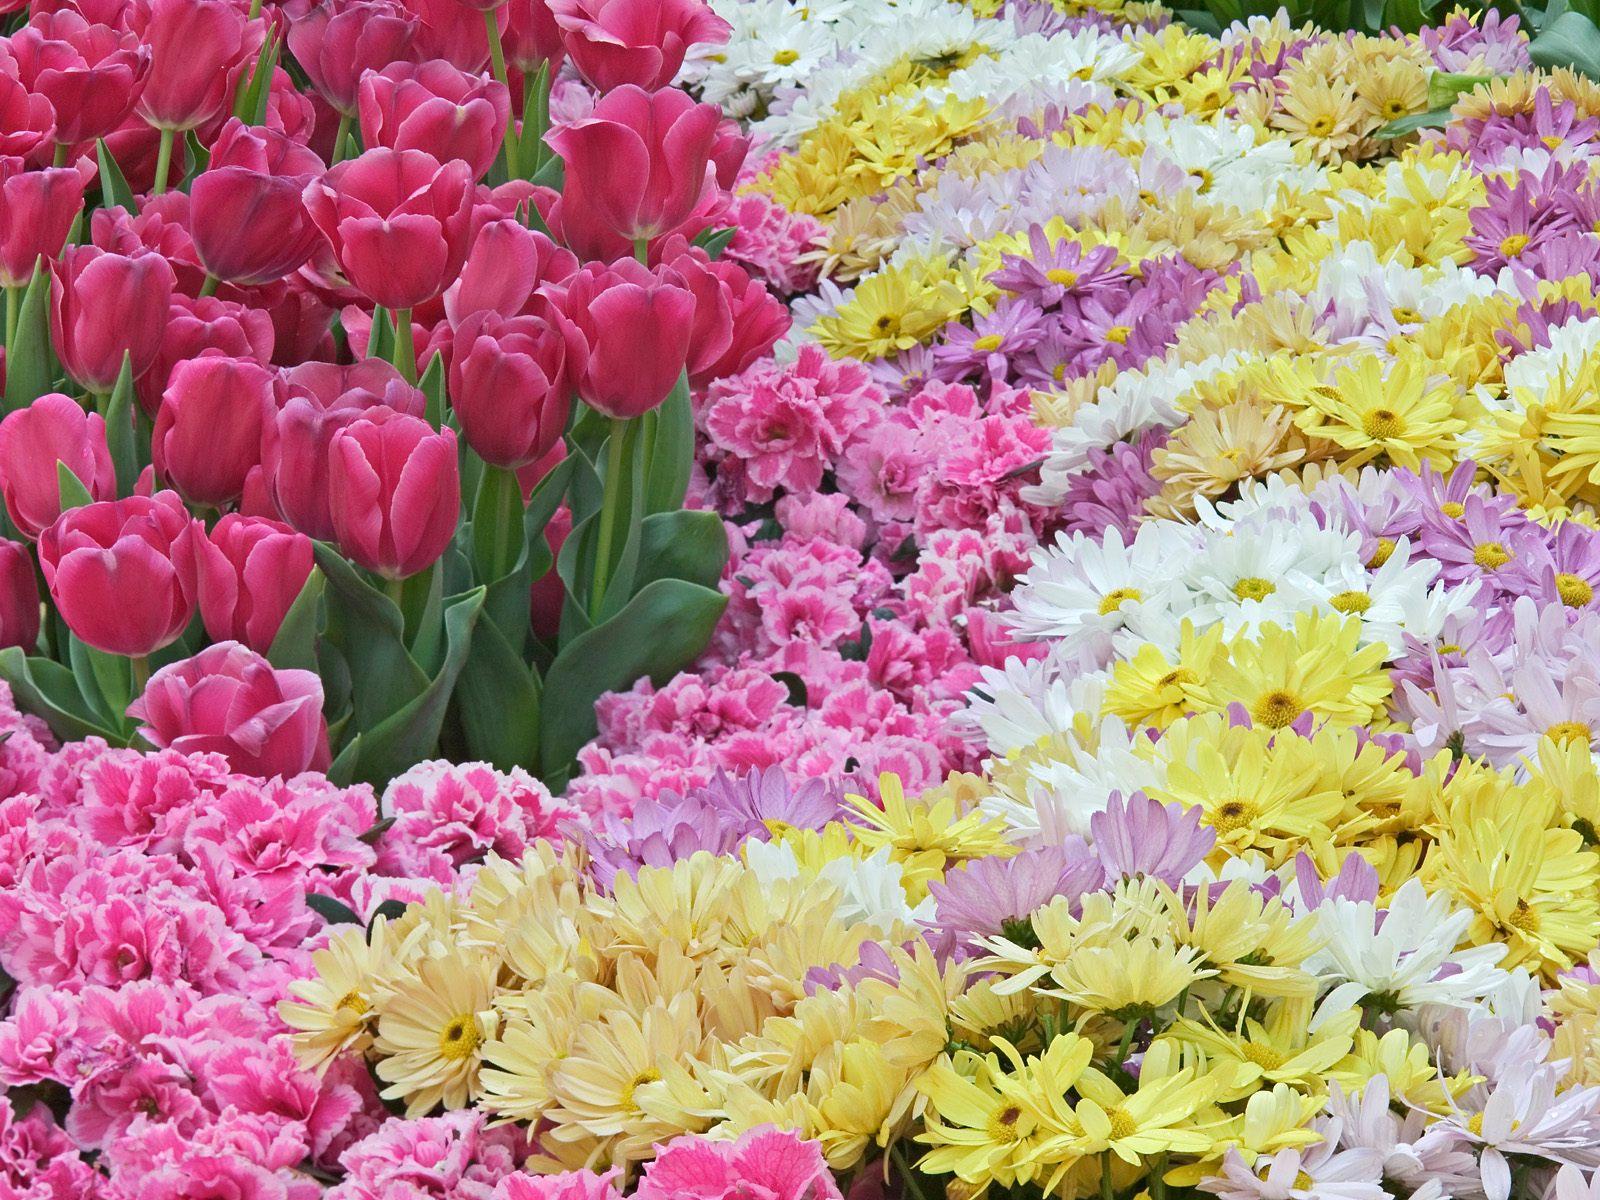 Natural Flower Wallpaper | Top HD Wallpapers